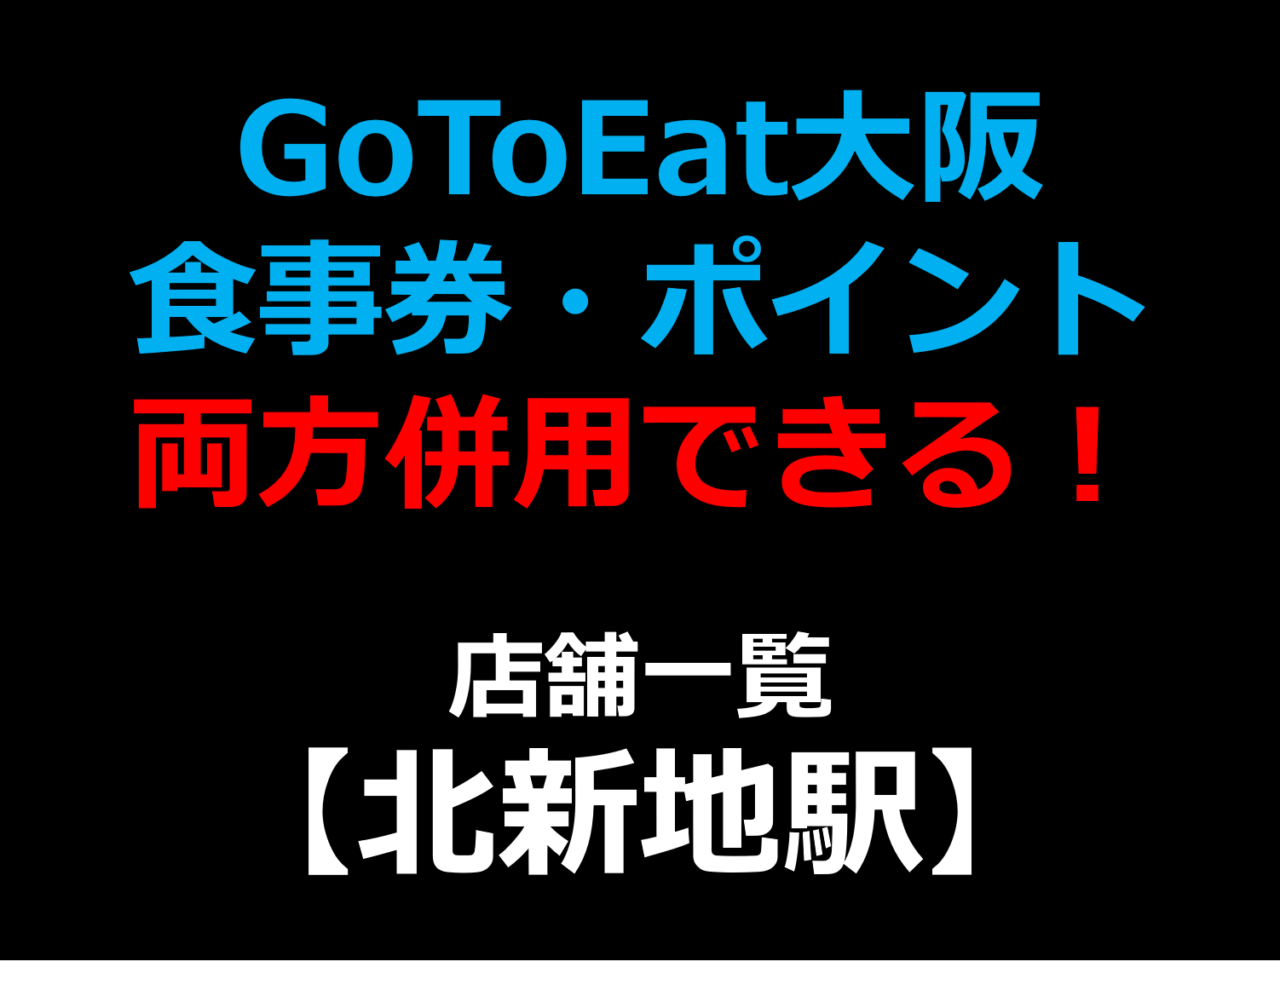 GoToEat大阪で食事券・予約サイトのポイント両方併用できる!使える!店舗一覧 【北新地駅】